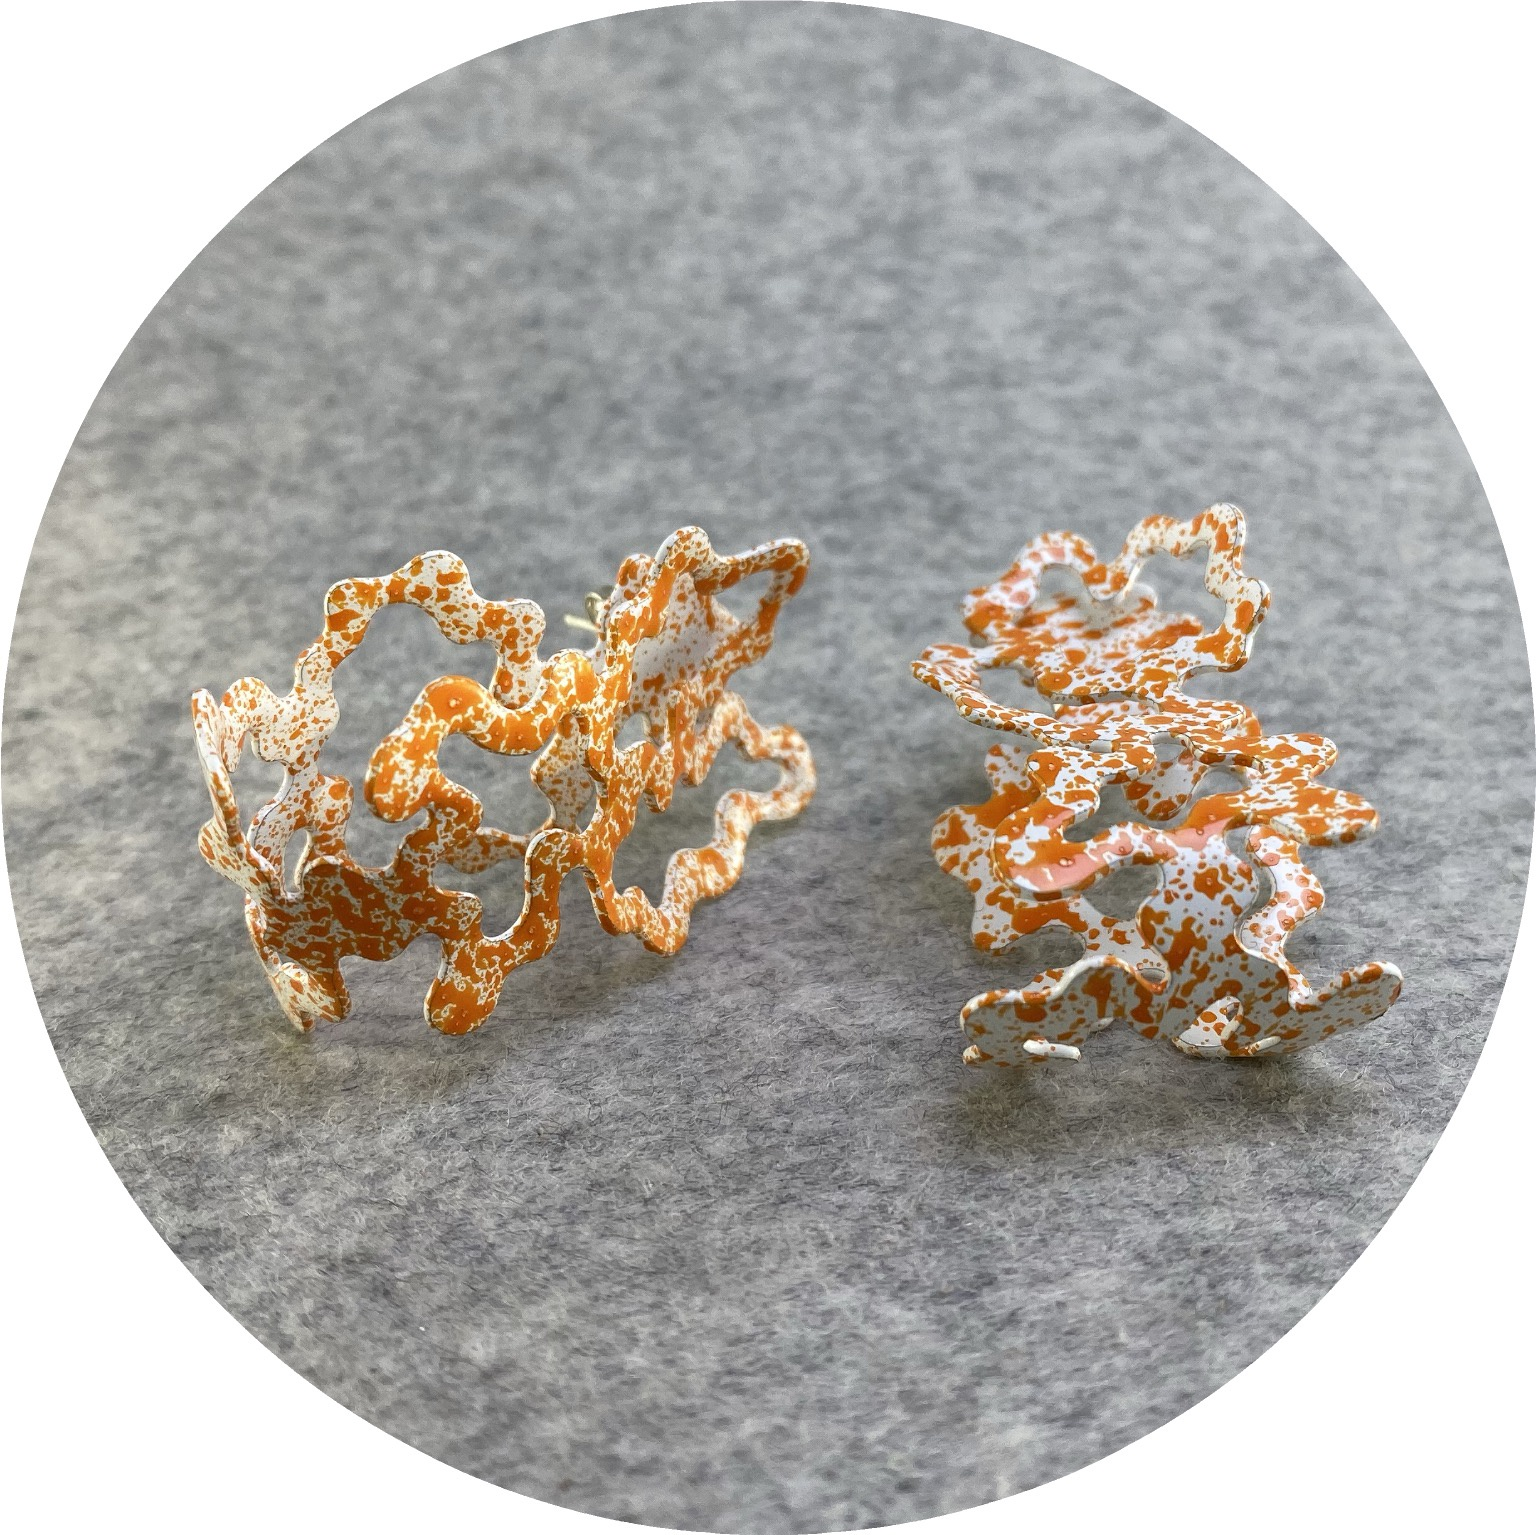 Cassandra Prinzi - 'Coral Clamshell Earrings Orange on White', copper, powder coat, enamel paint, 925 silver